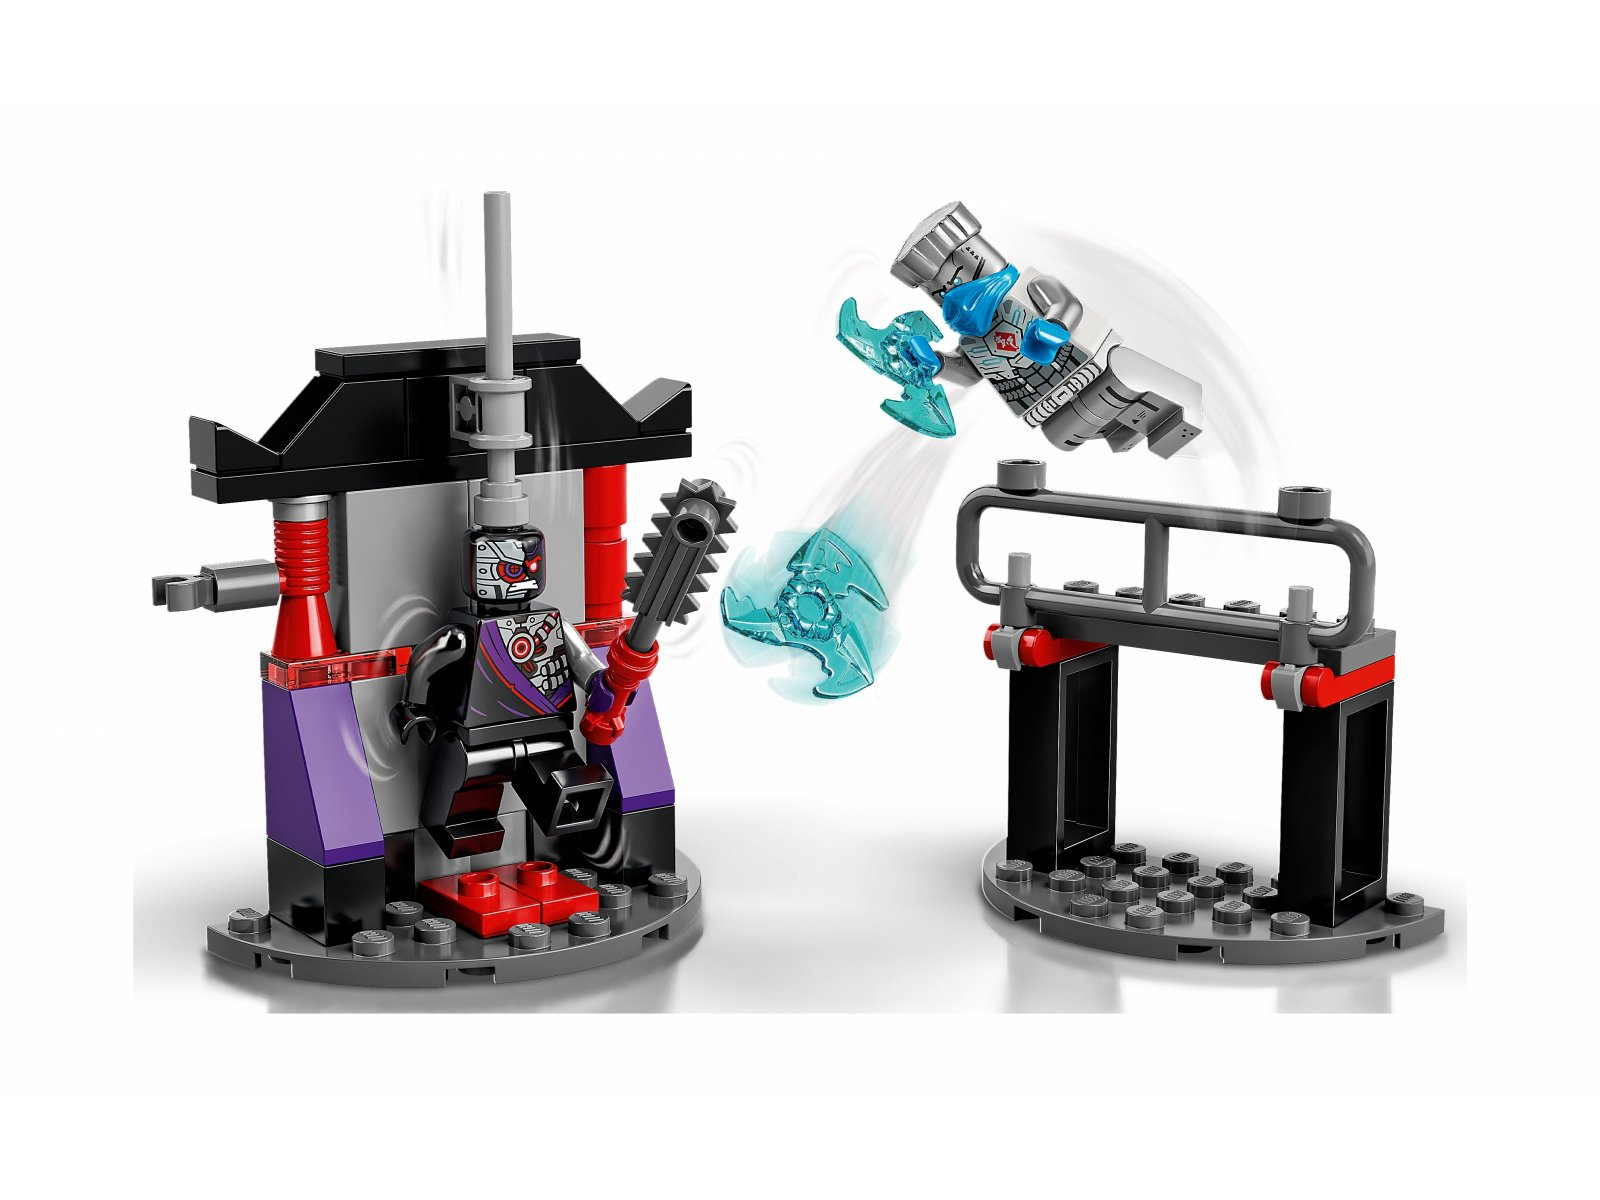 LEGO Ninjago 71731 Epicki zestaw bojowy - Zane kontra Nindroid